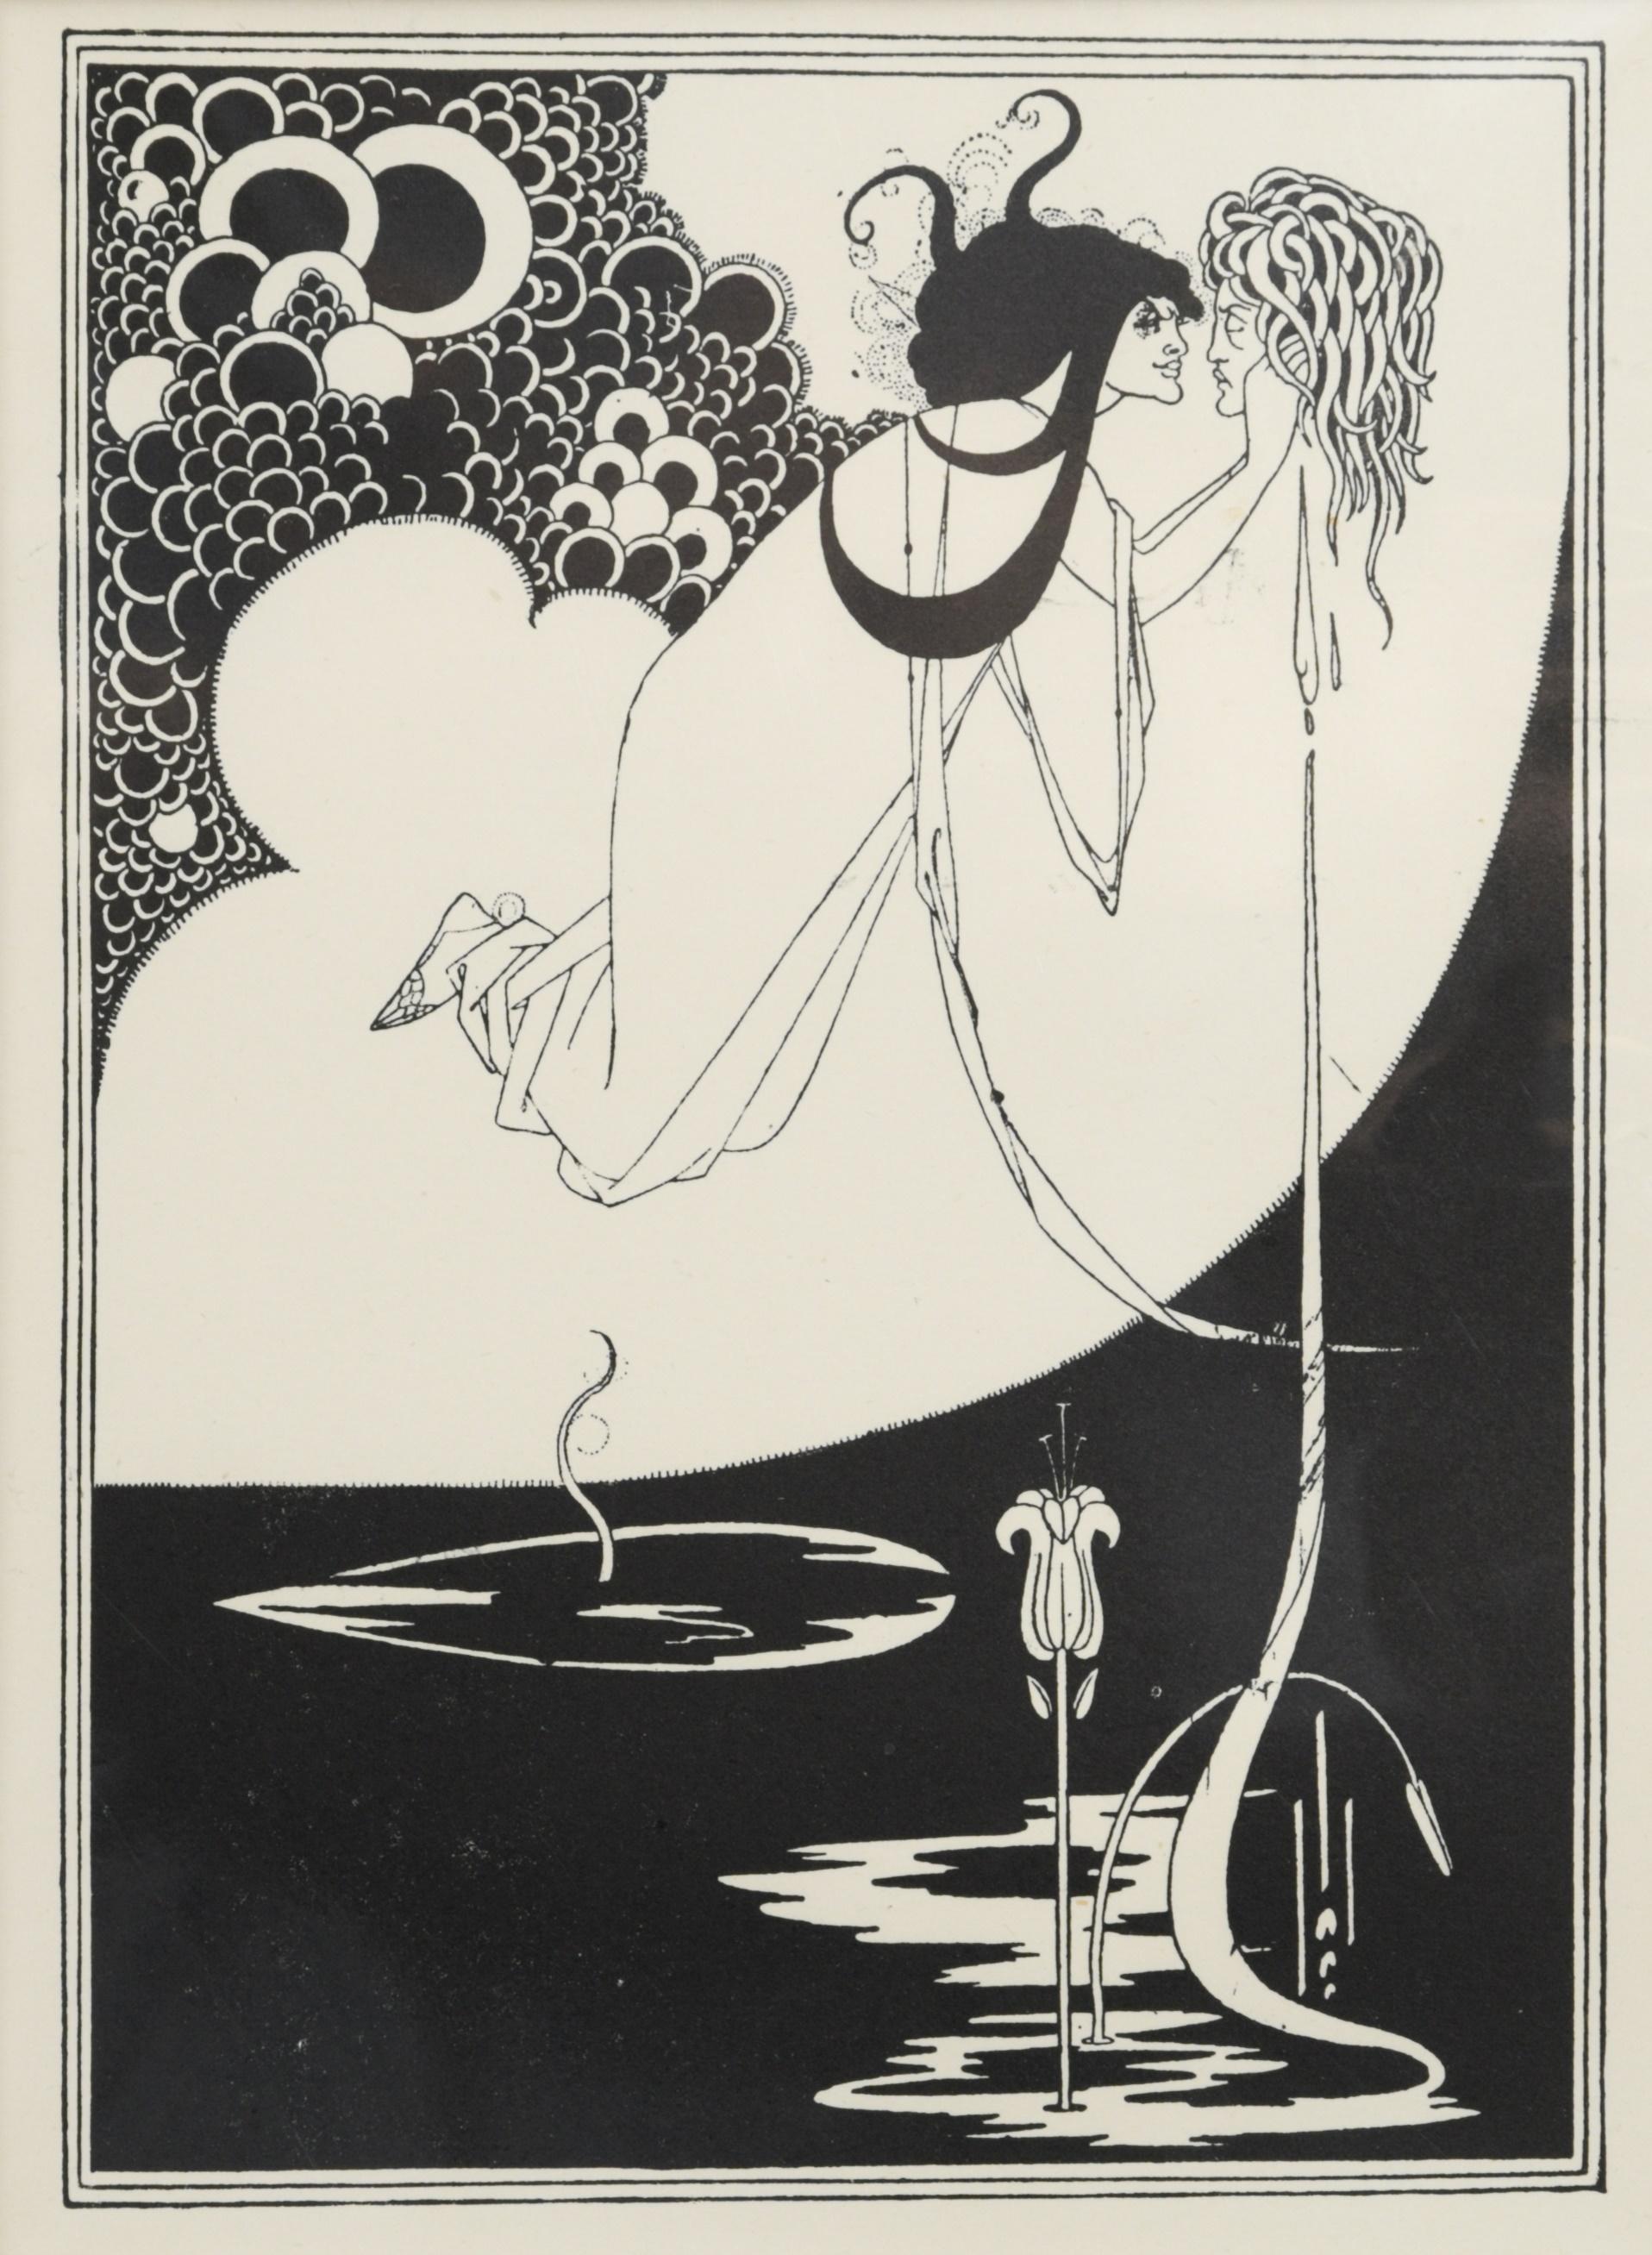 Aubrey Beardsley (British 1872-1898)